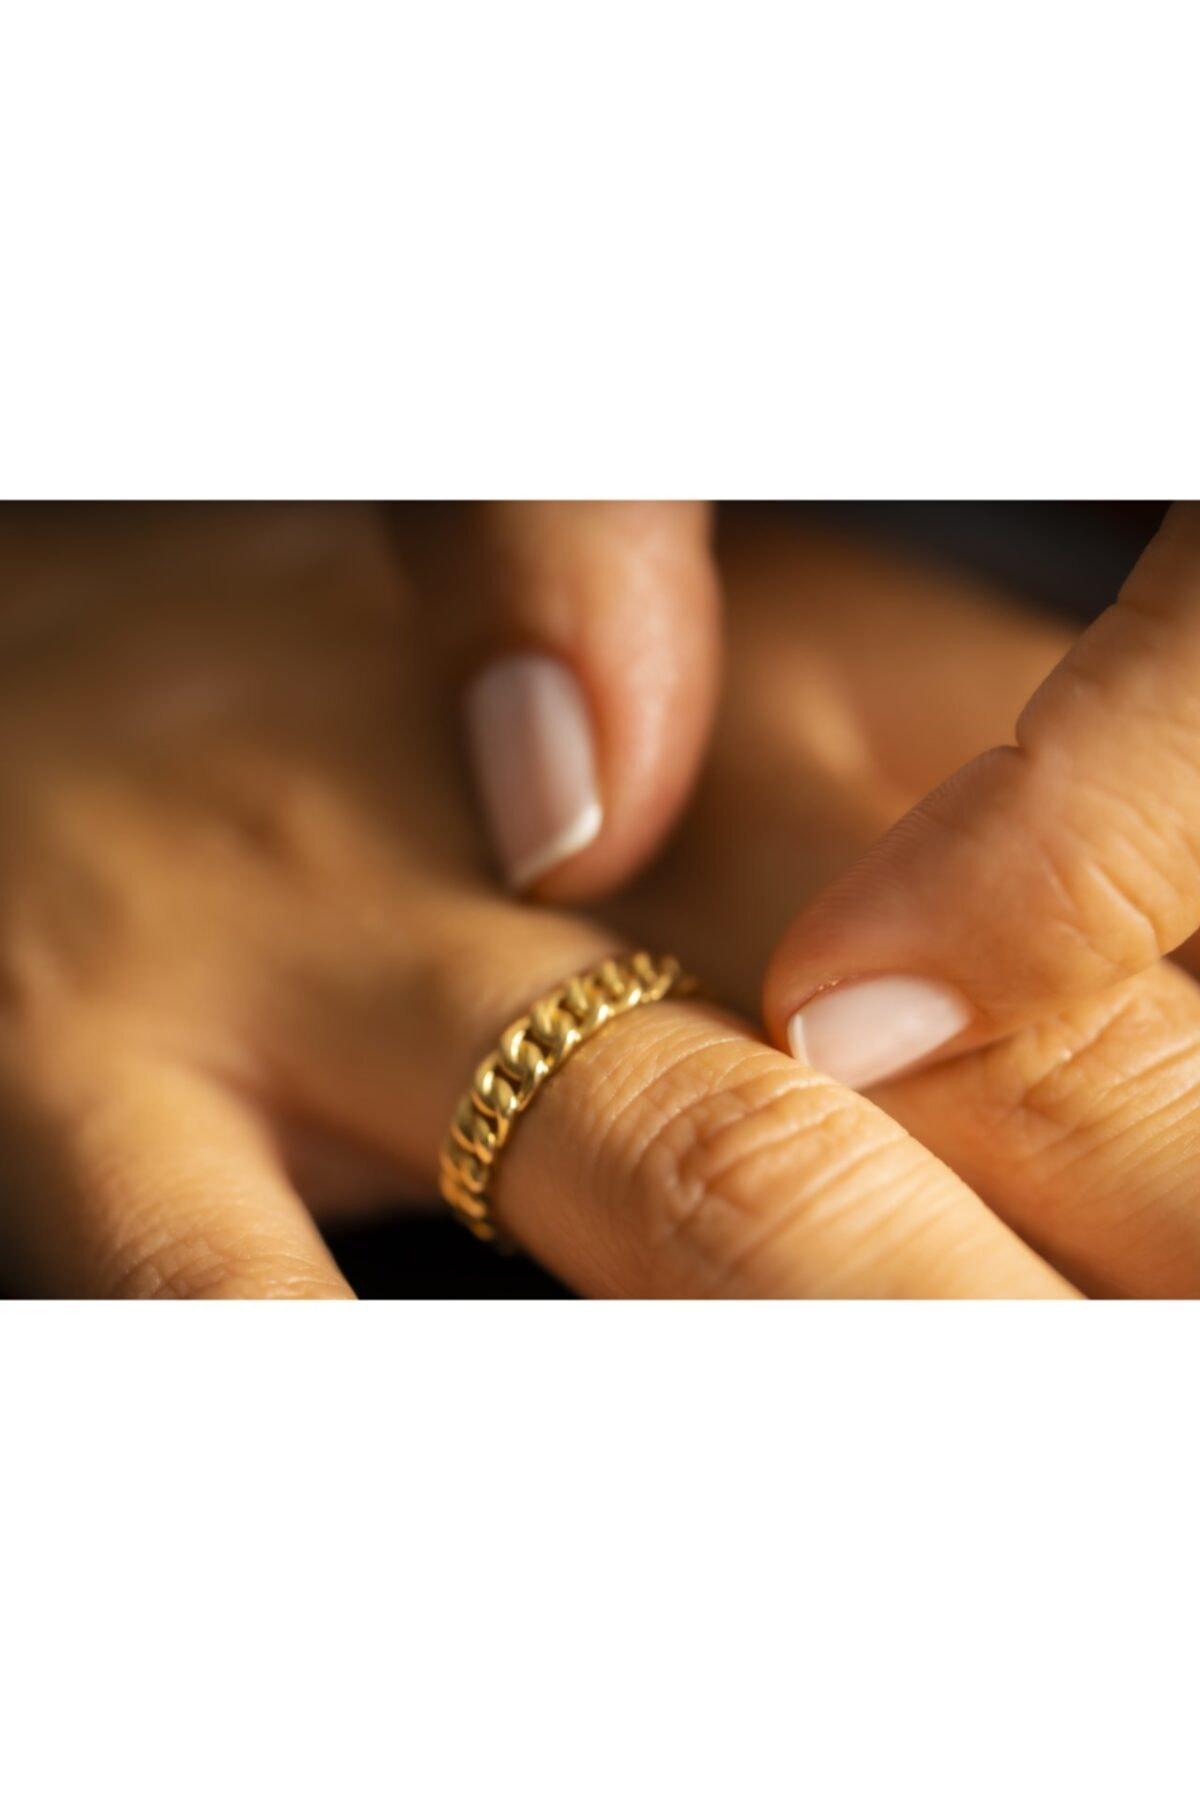 فروش انگشتر طلا زنانه فانتزی برند SİVAS KUYUMCULUK رنگ صورتی ty99647655